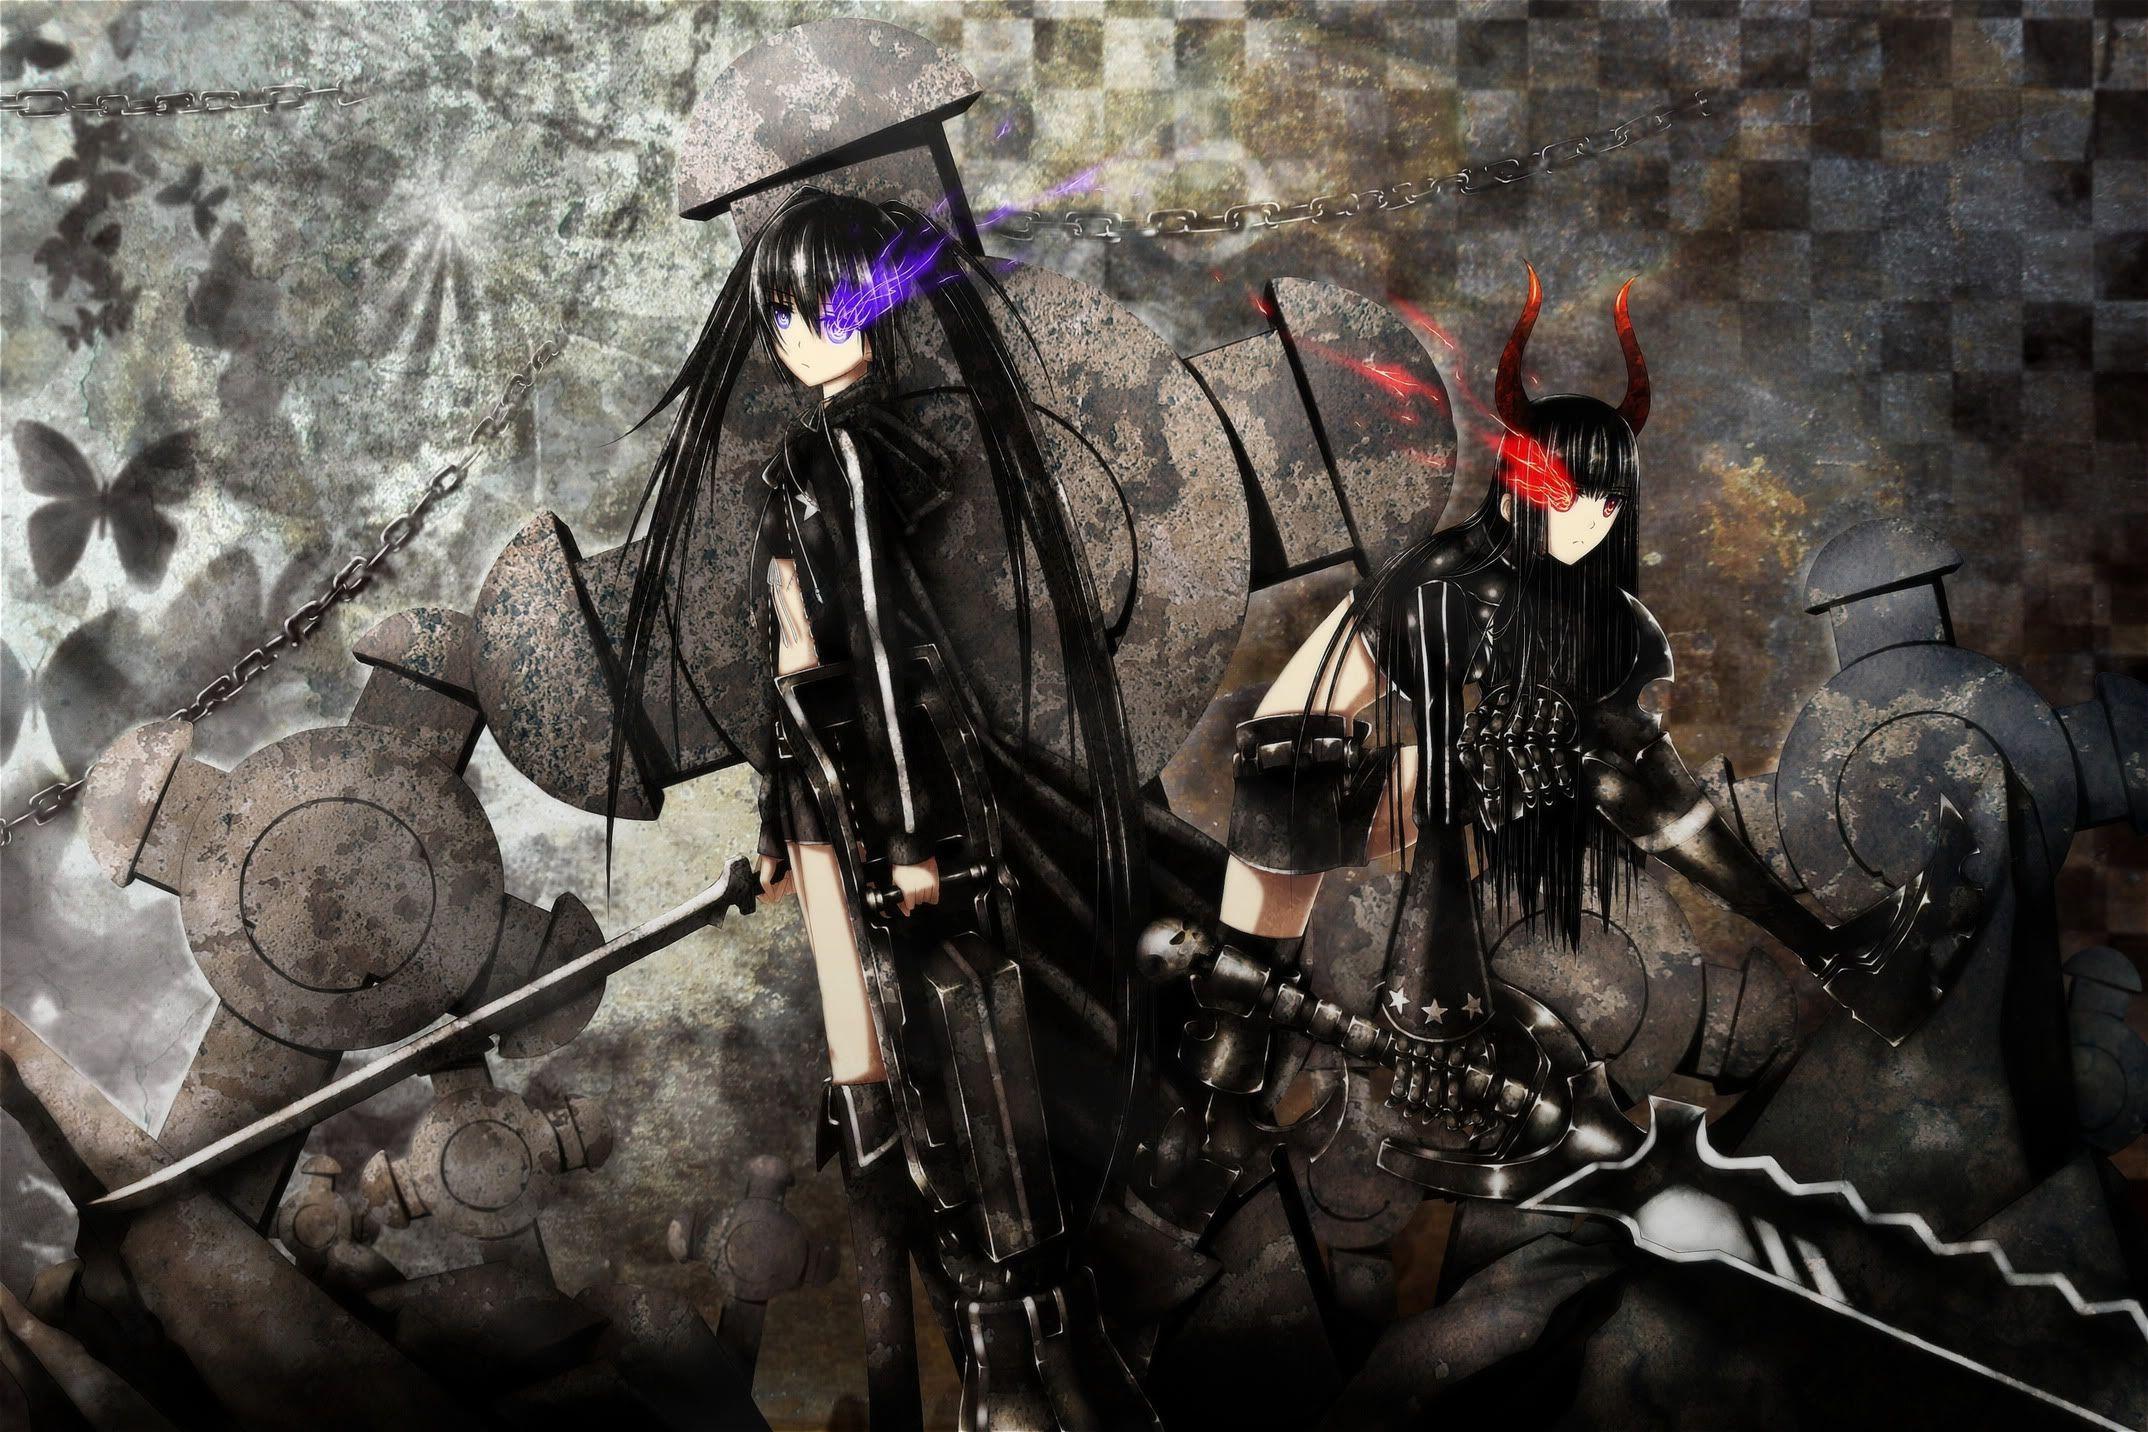 Anime Black Rock Shooter Black Rock Shooter Ova Anime Badass Girl Weapon Sword Black Rock Shooter Anime Wolf Girl Anime Wallpaper